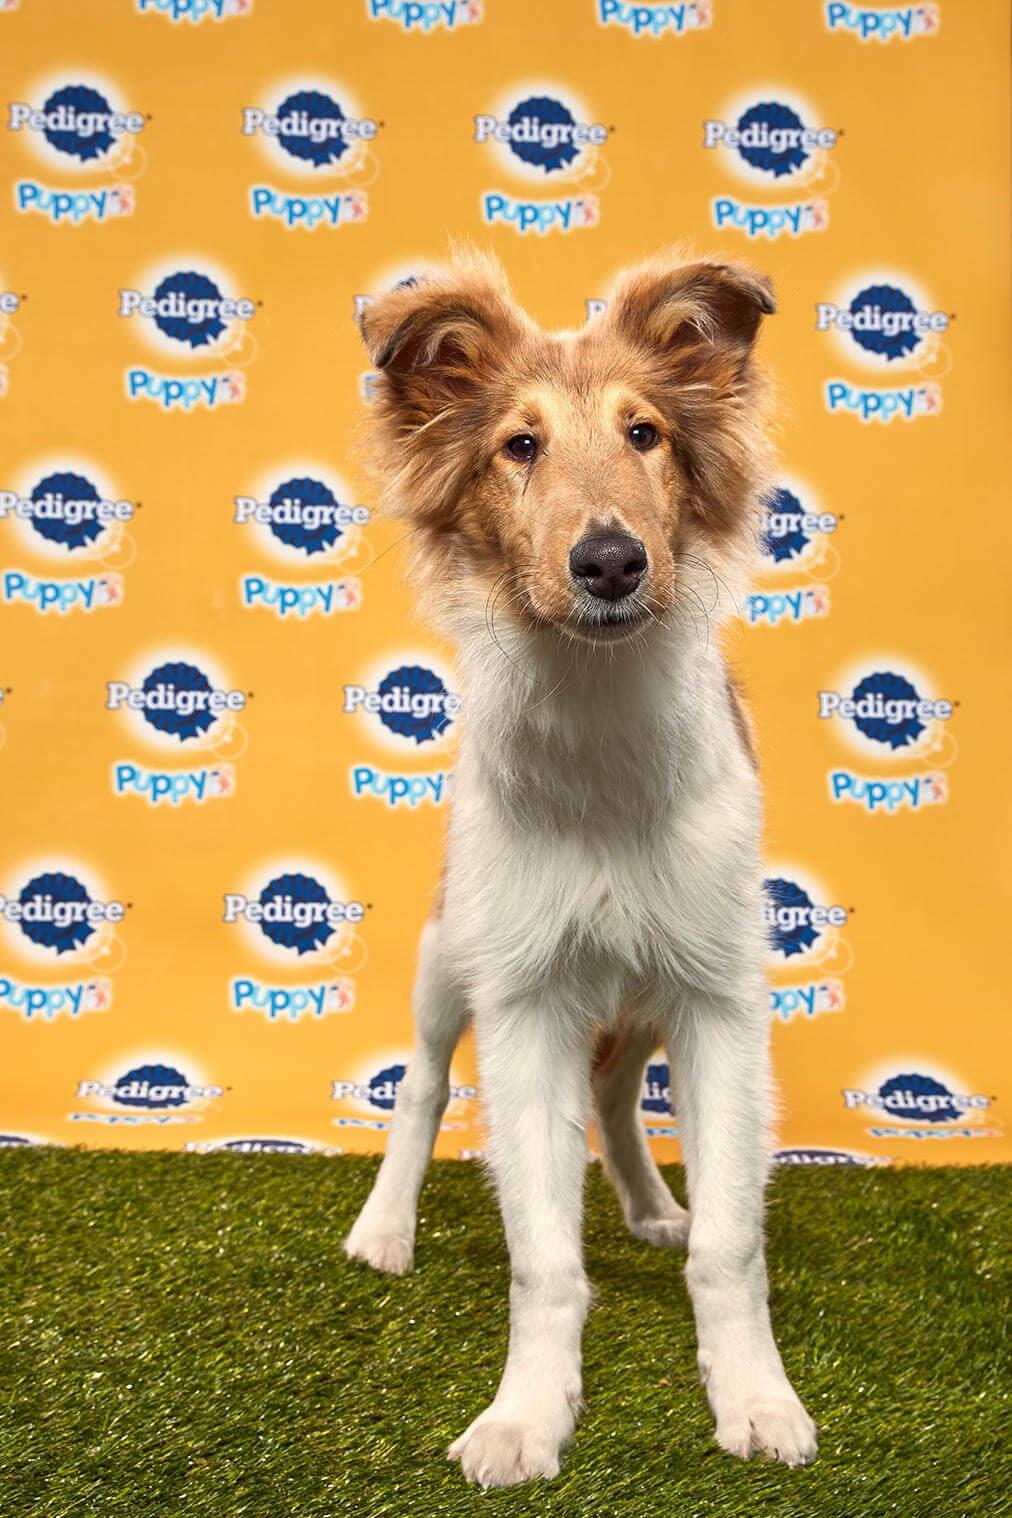 Duncan Dog - Animal Planet